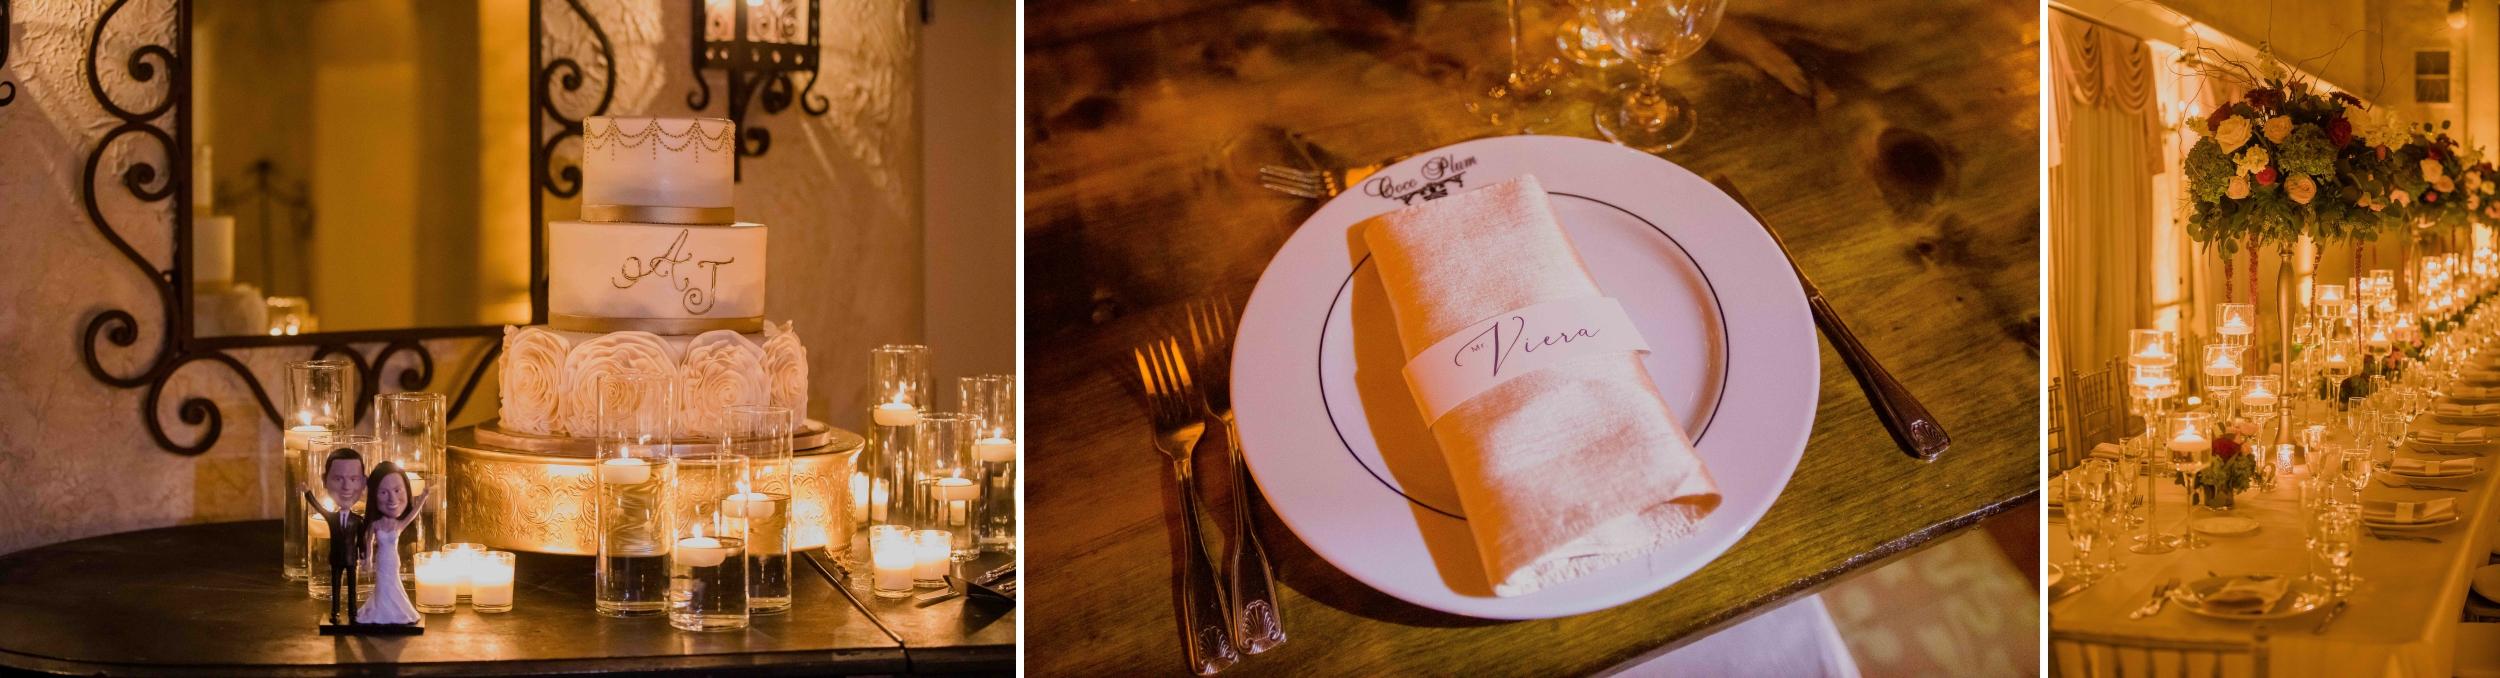 Wedding - Coco Plum - Coral Gables Congregational - Santy Martinez Photography 28.jpg